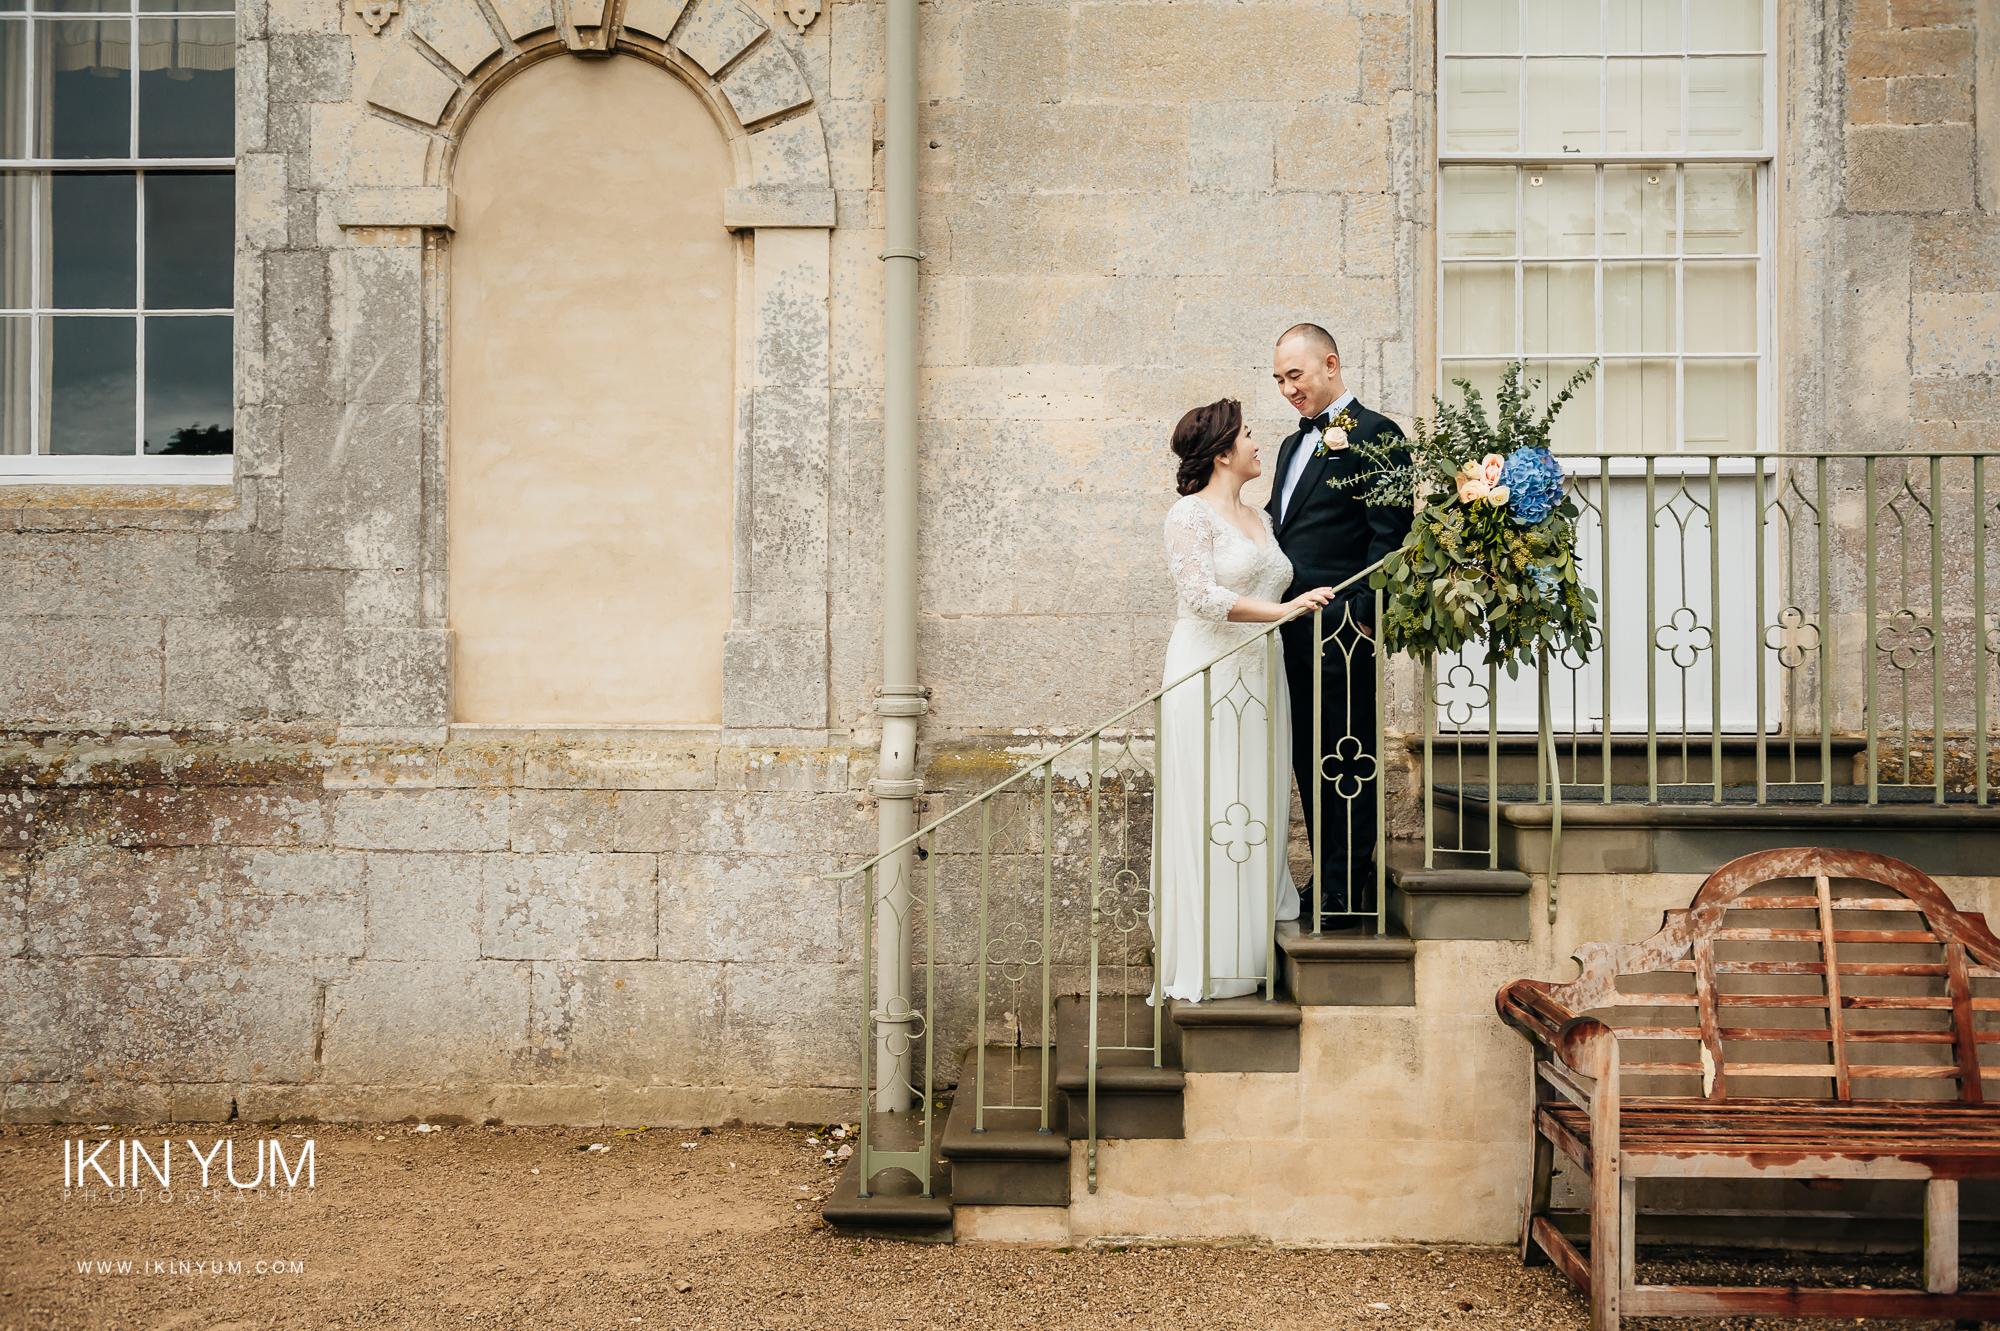 Elmore Court Wedding- Ikin Yum Photography-0075.jpg